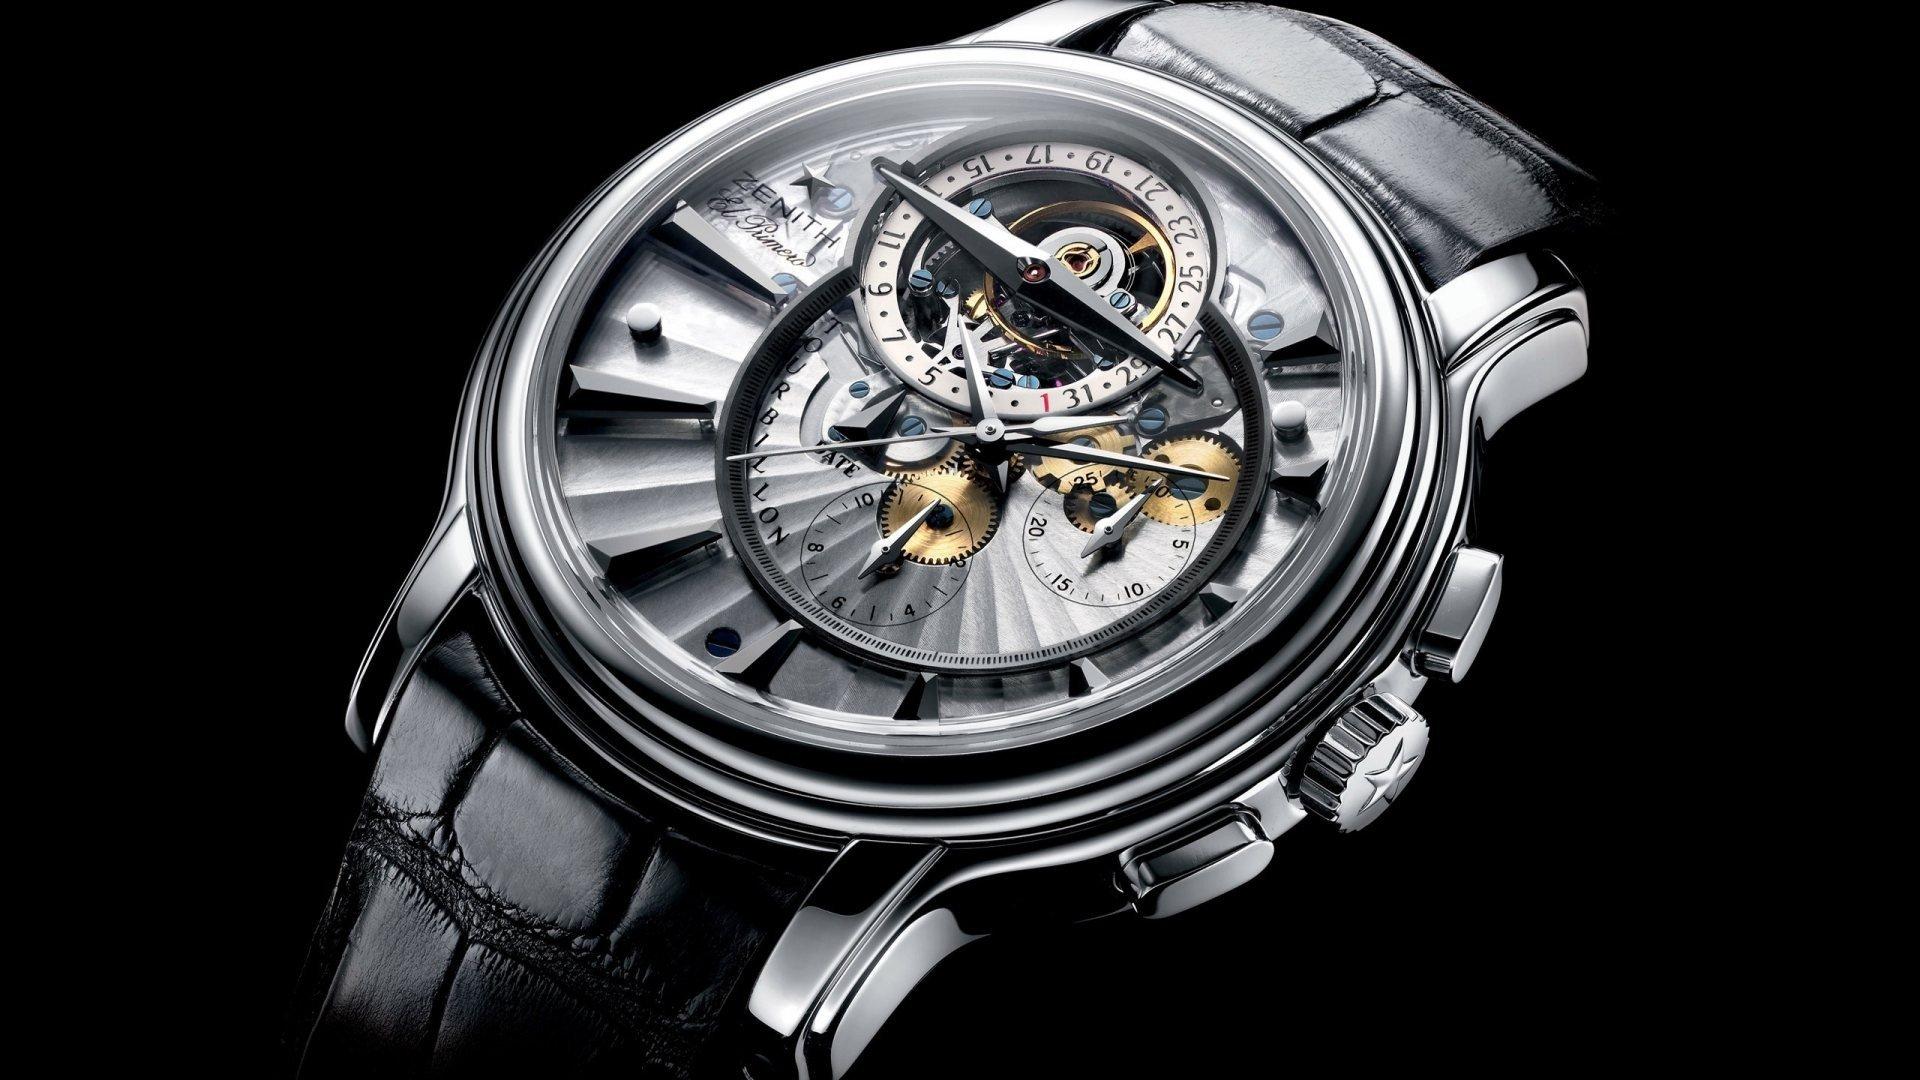 Wallpaper 1920x1080 Px Luxury Watches Watch 1920x1080 Wallhaven 1213680 Hd Wallpapers Wallhere